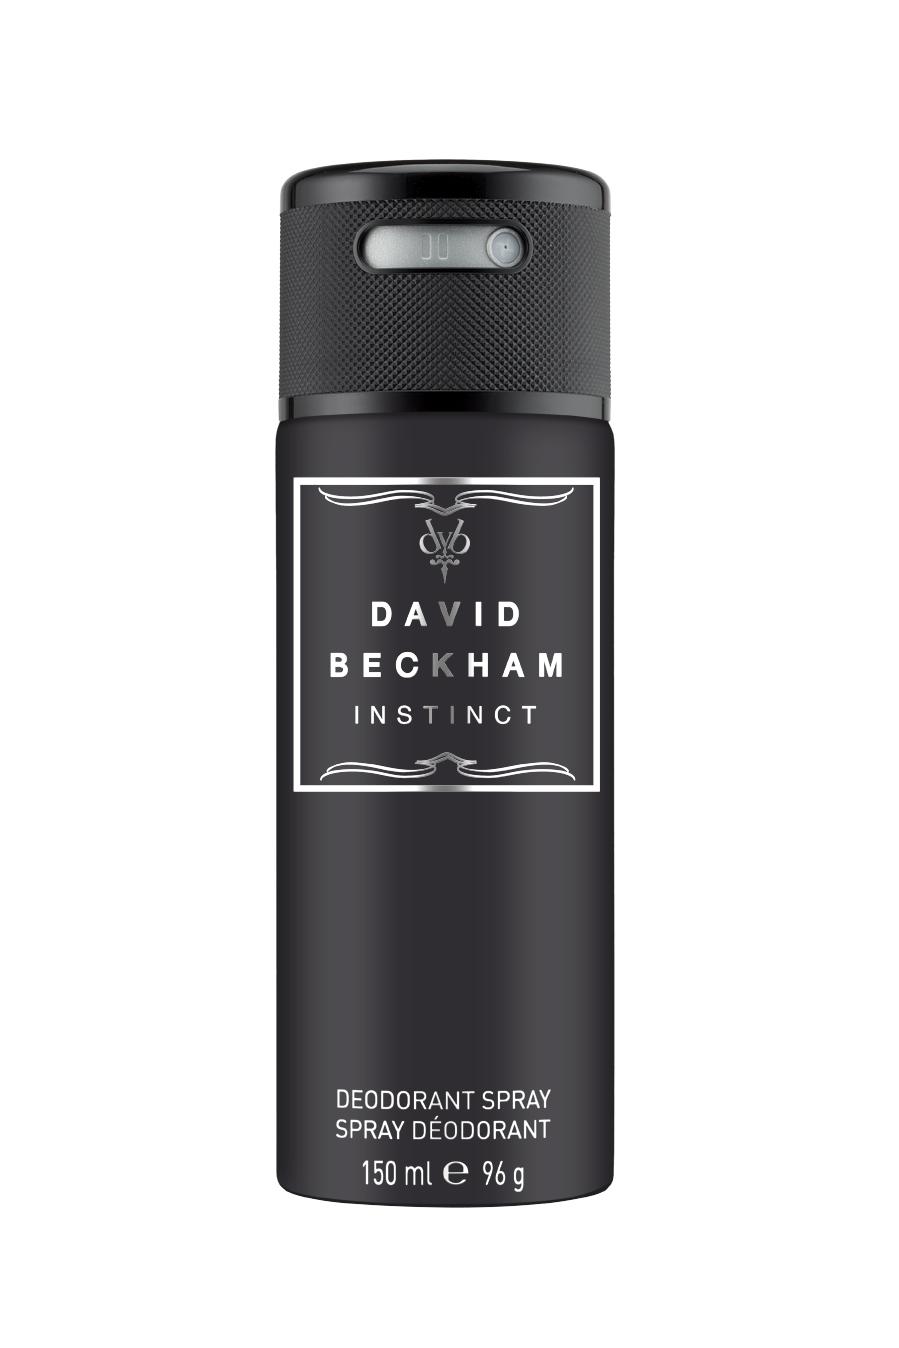 David Beckham | Instinct Deodorant Spray 150 ML